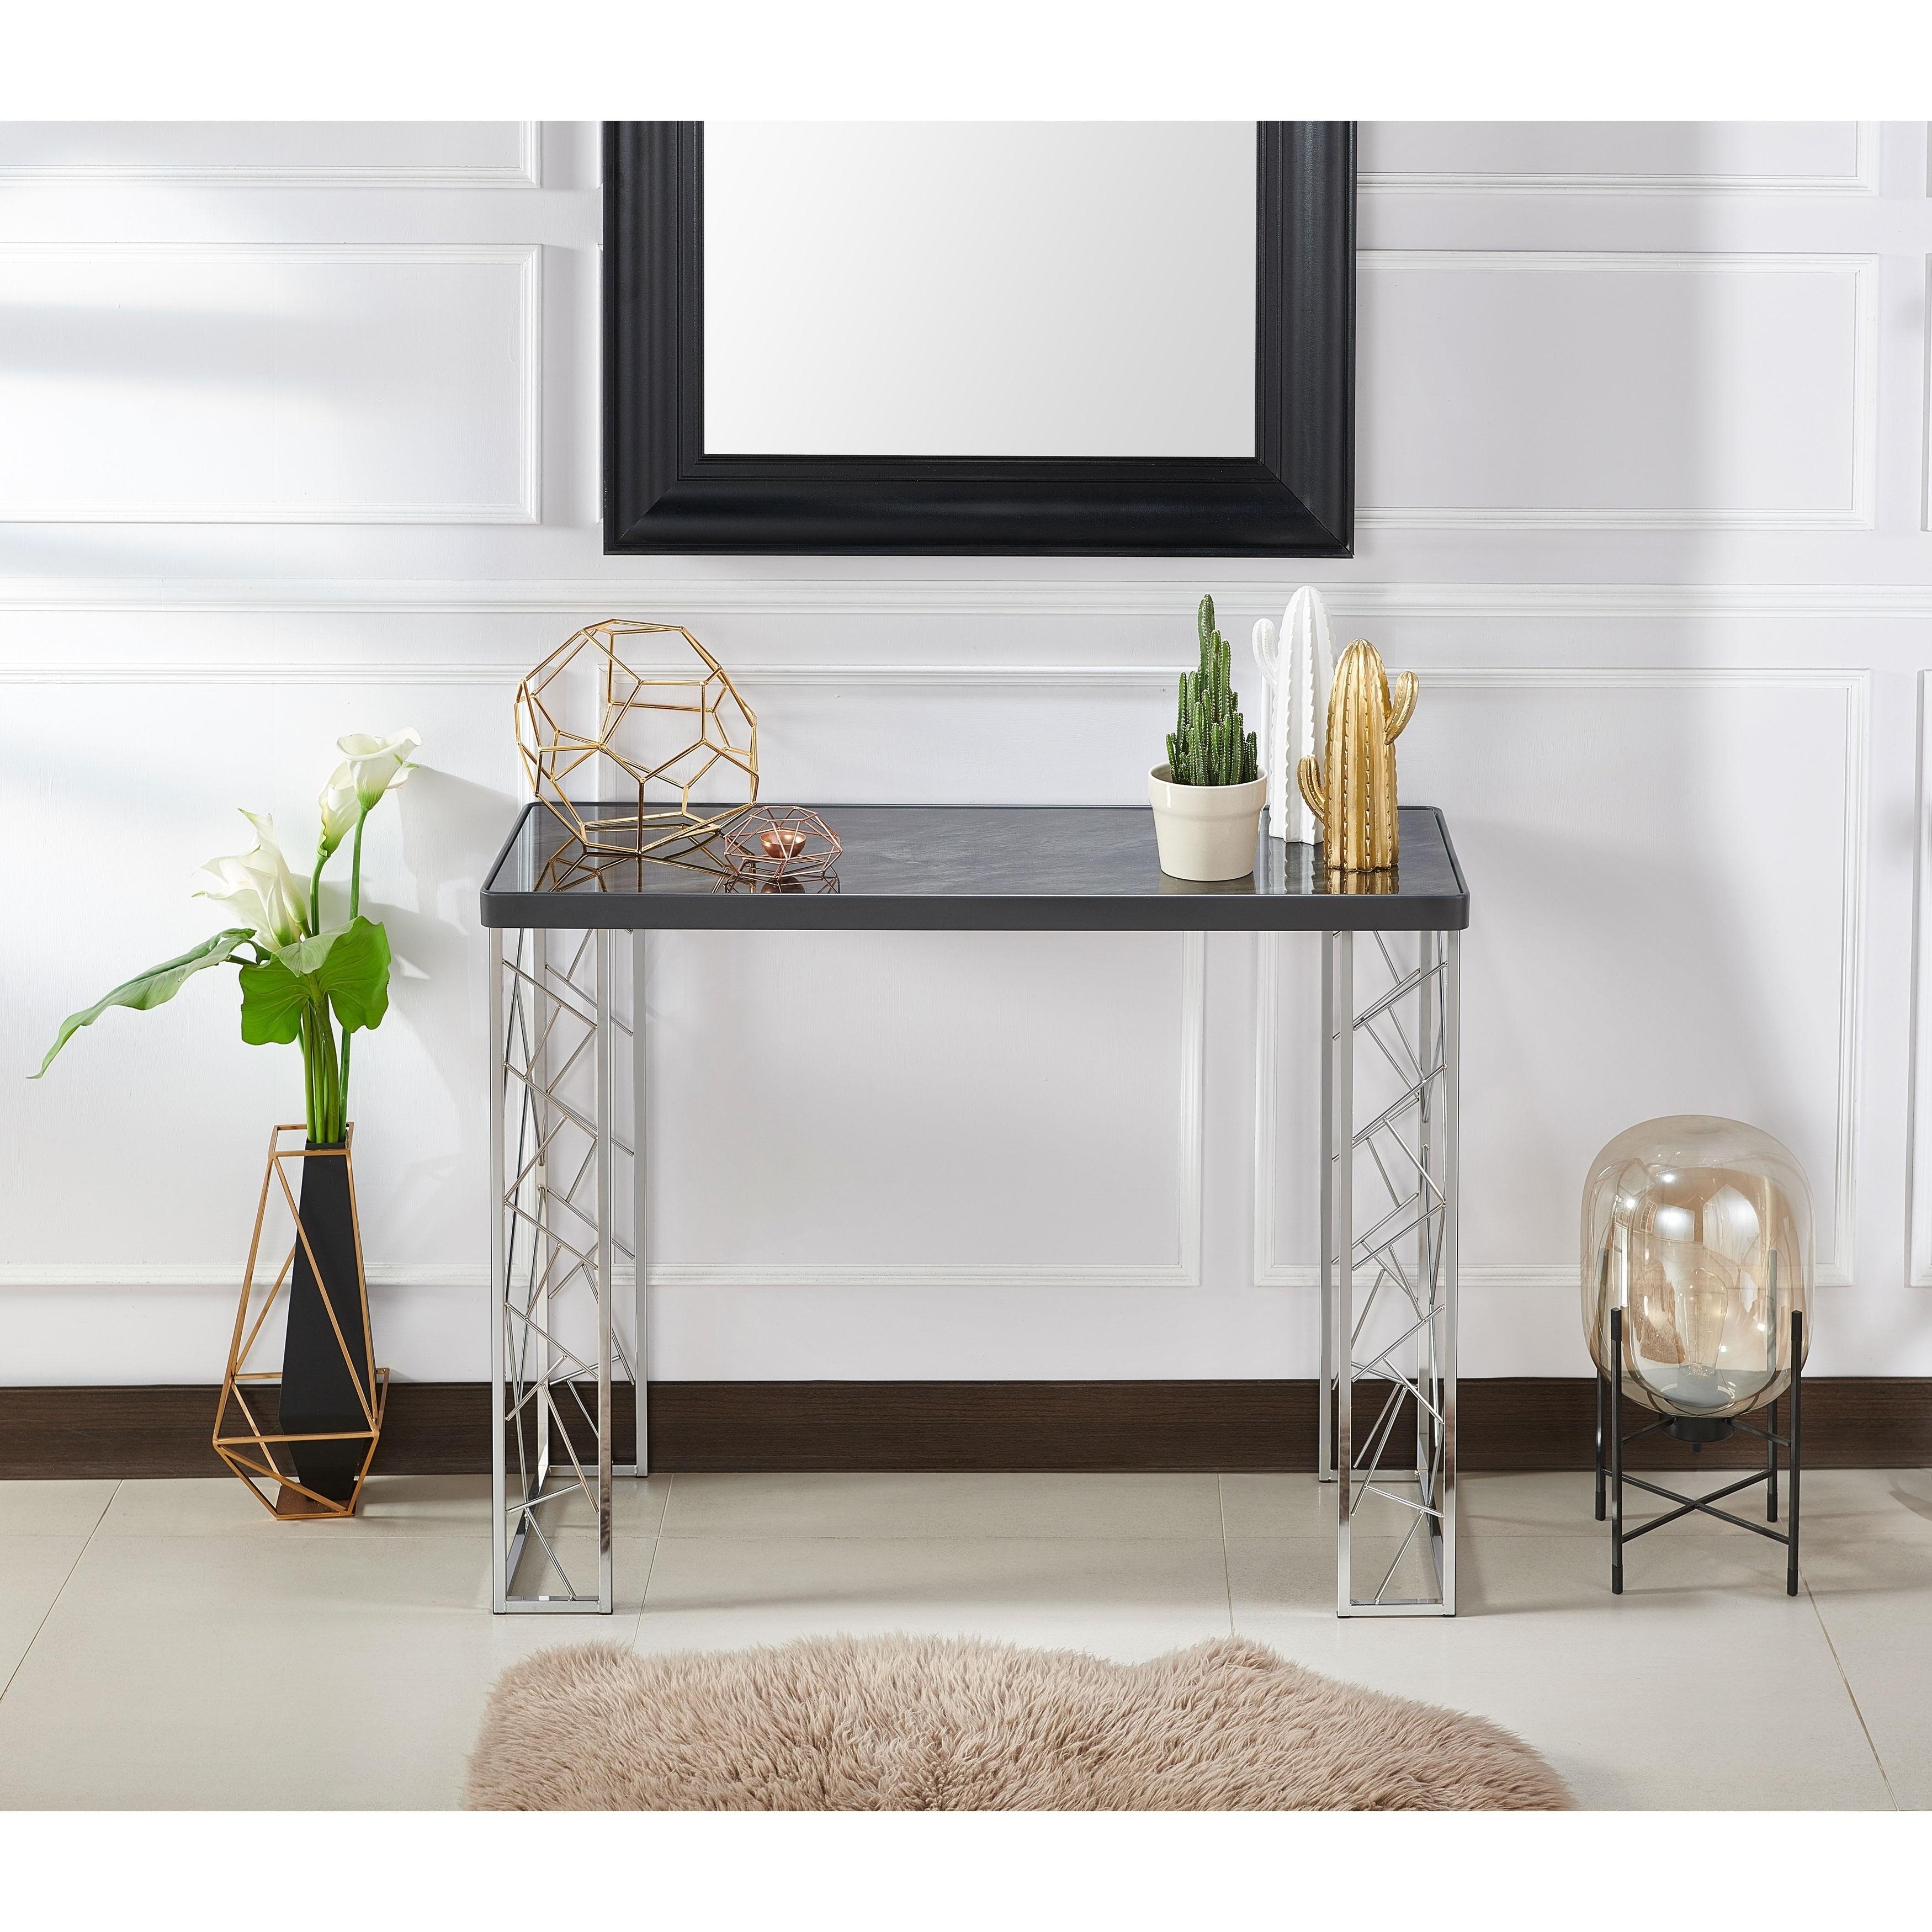 Furniture Of America Noirel Black Chrome Glass Metal Modern Sofa